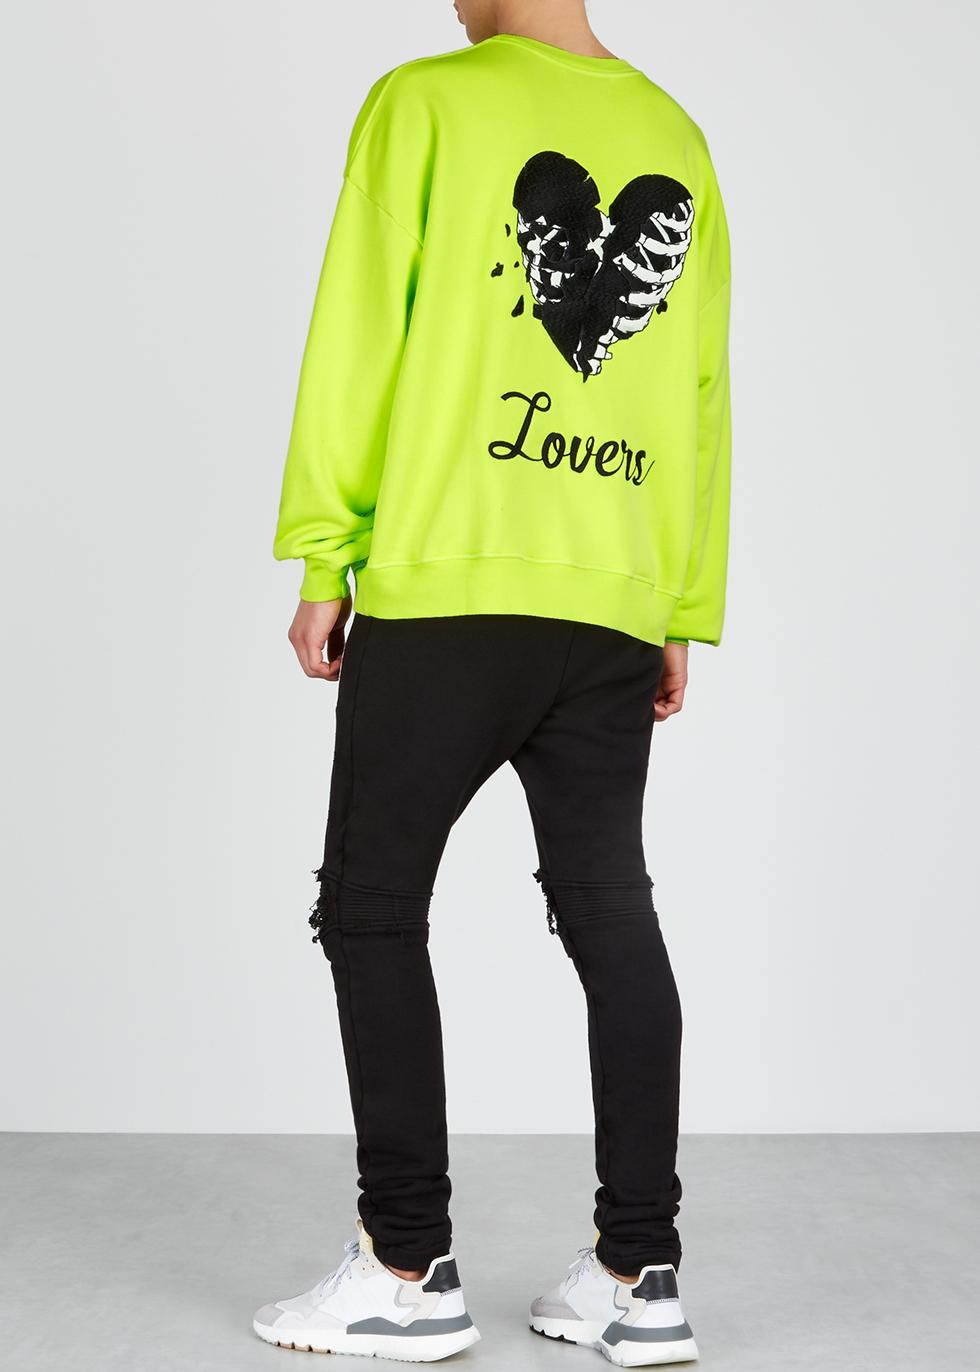 Lovers neon yellow cotton sweatshirt - Amiri